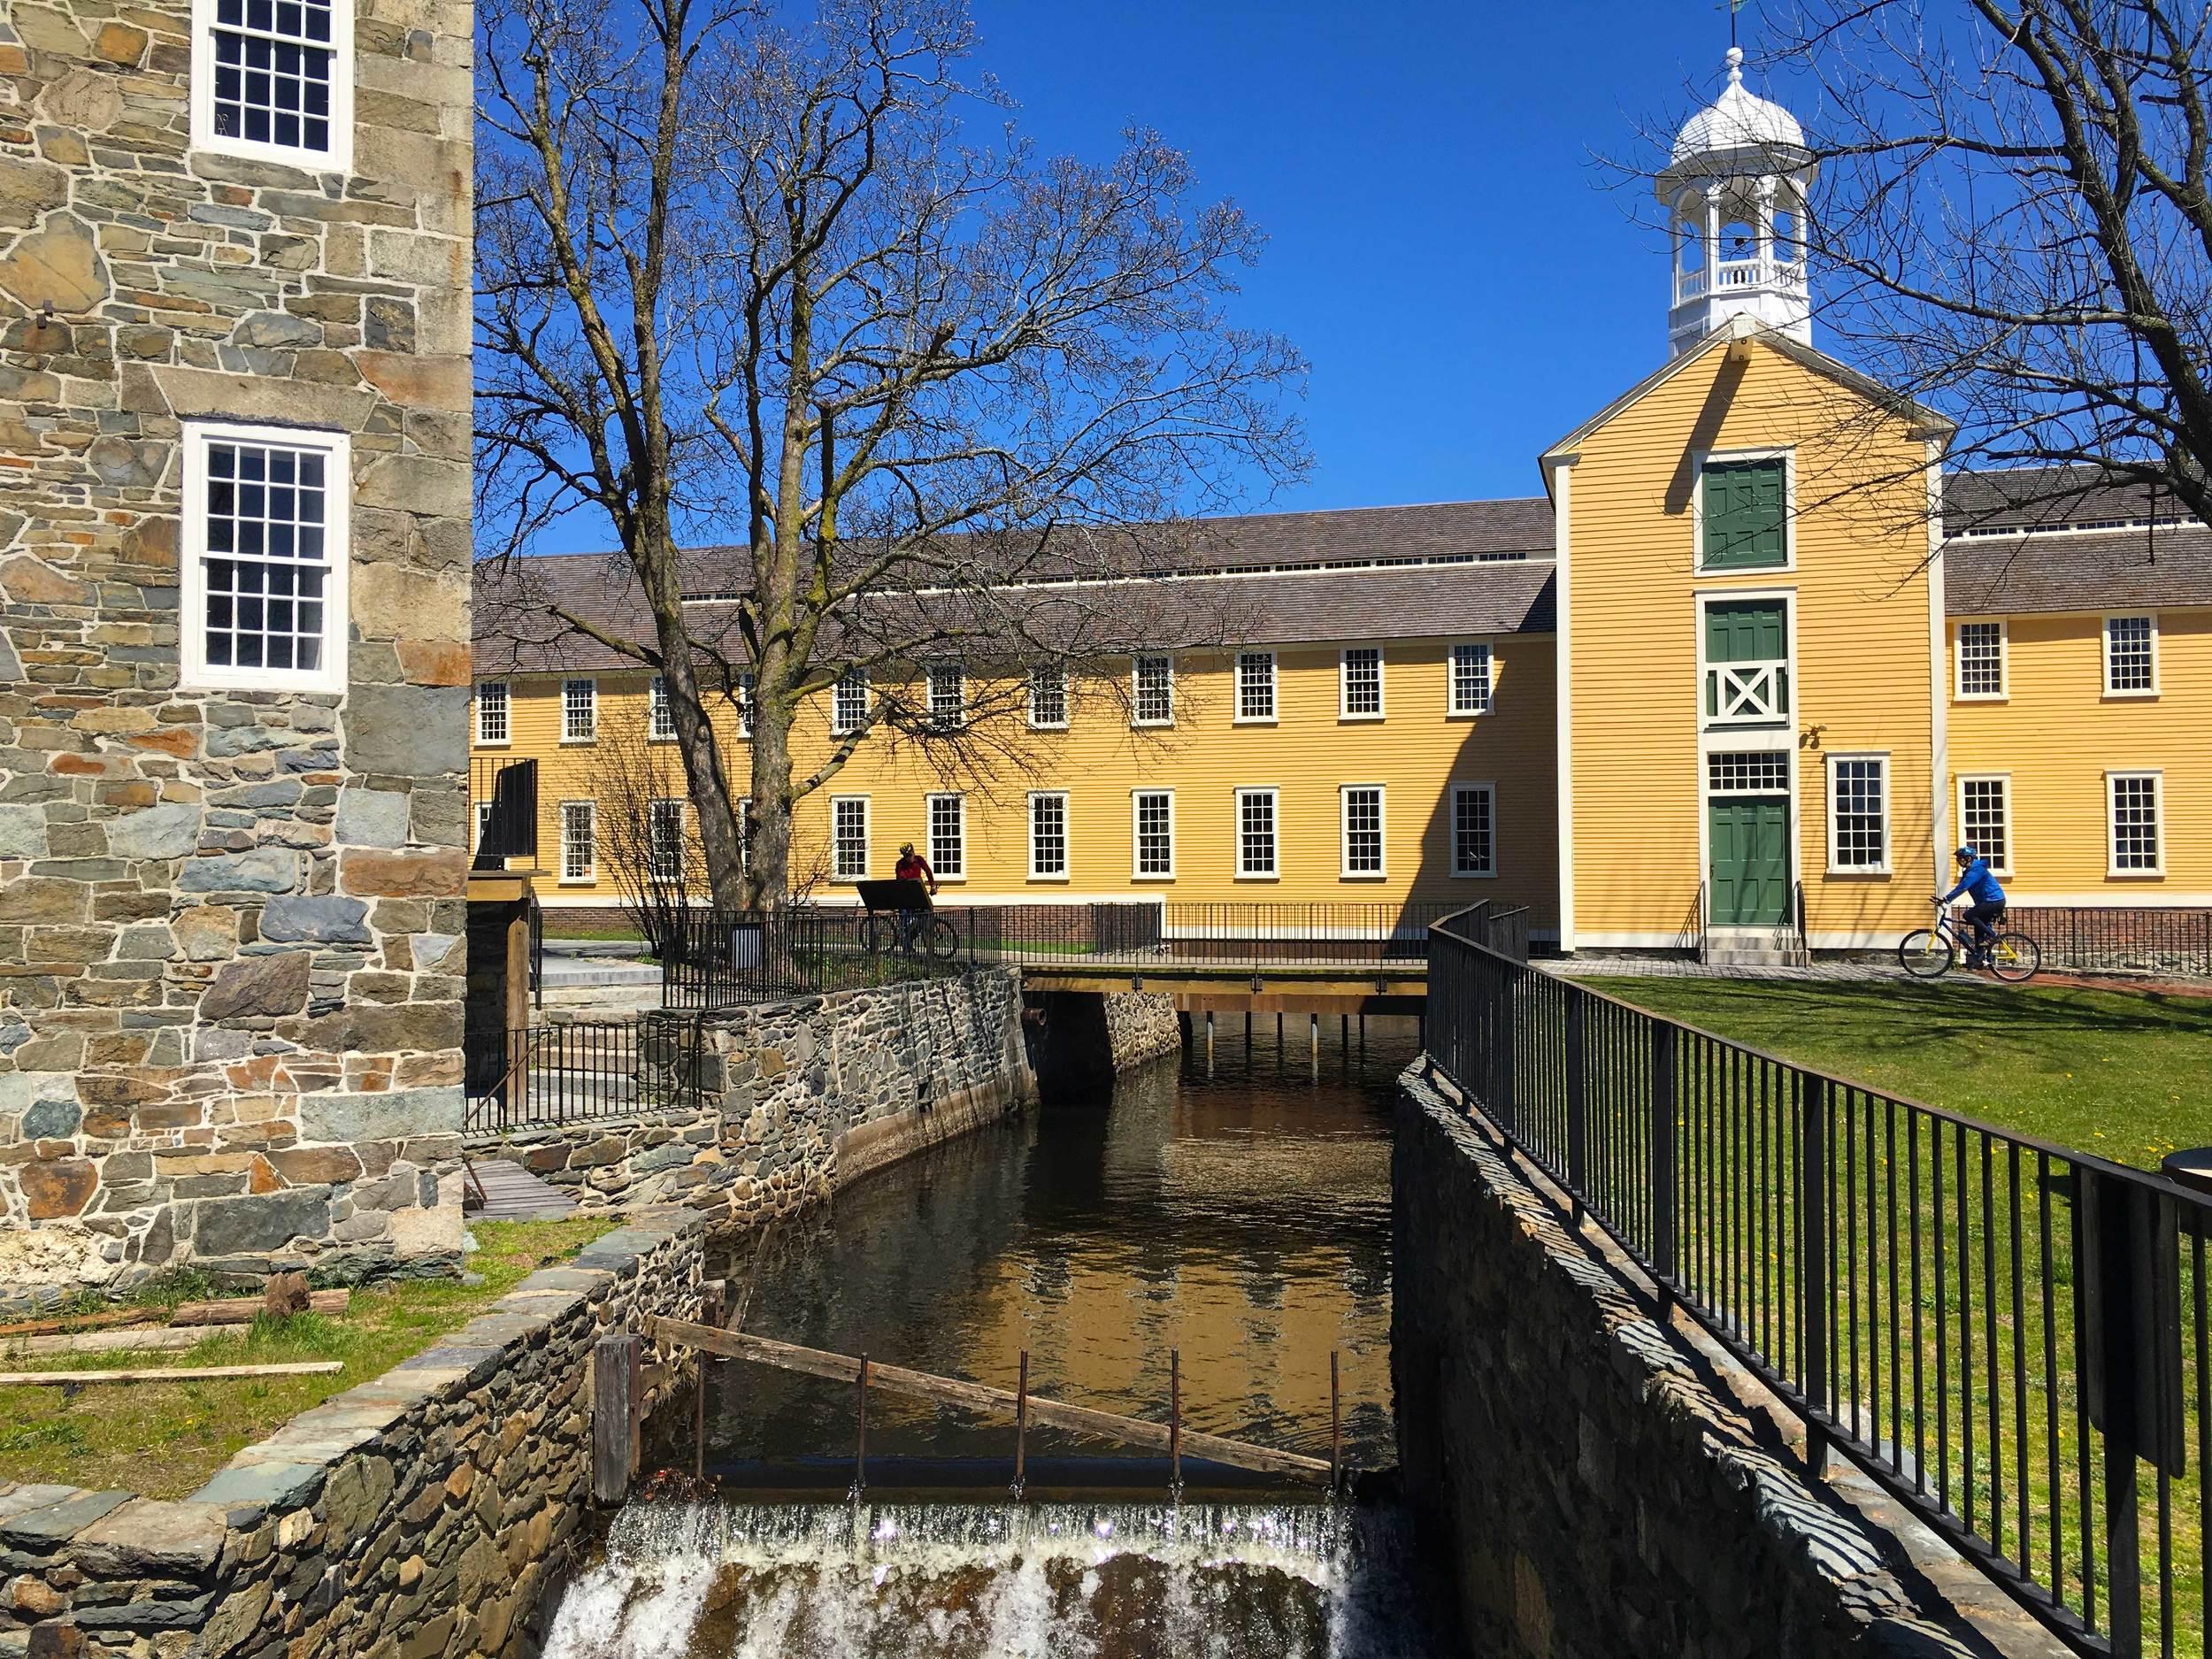 Wilkinson Mill, Blackstone River Valley National Historic Park, photo by Derek Wright.